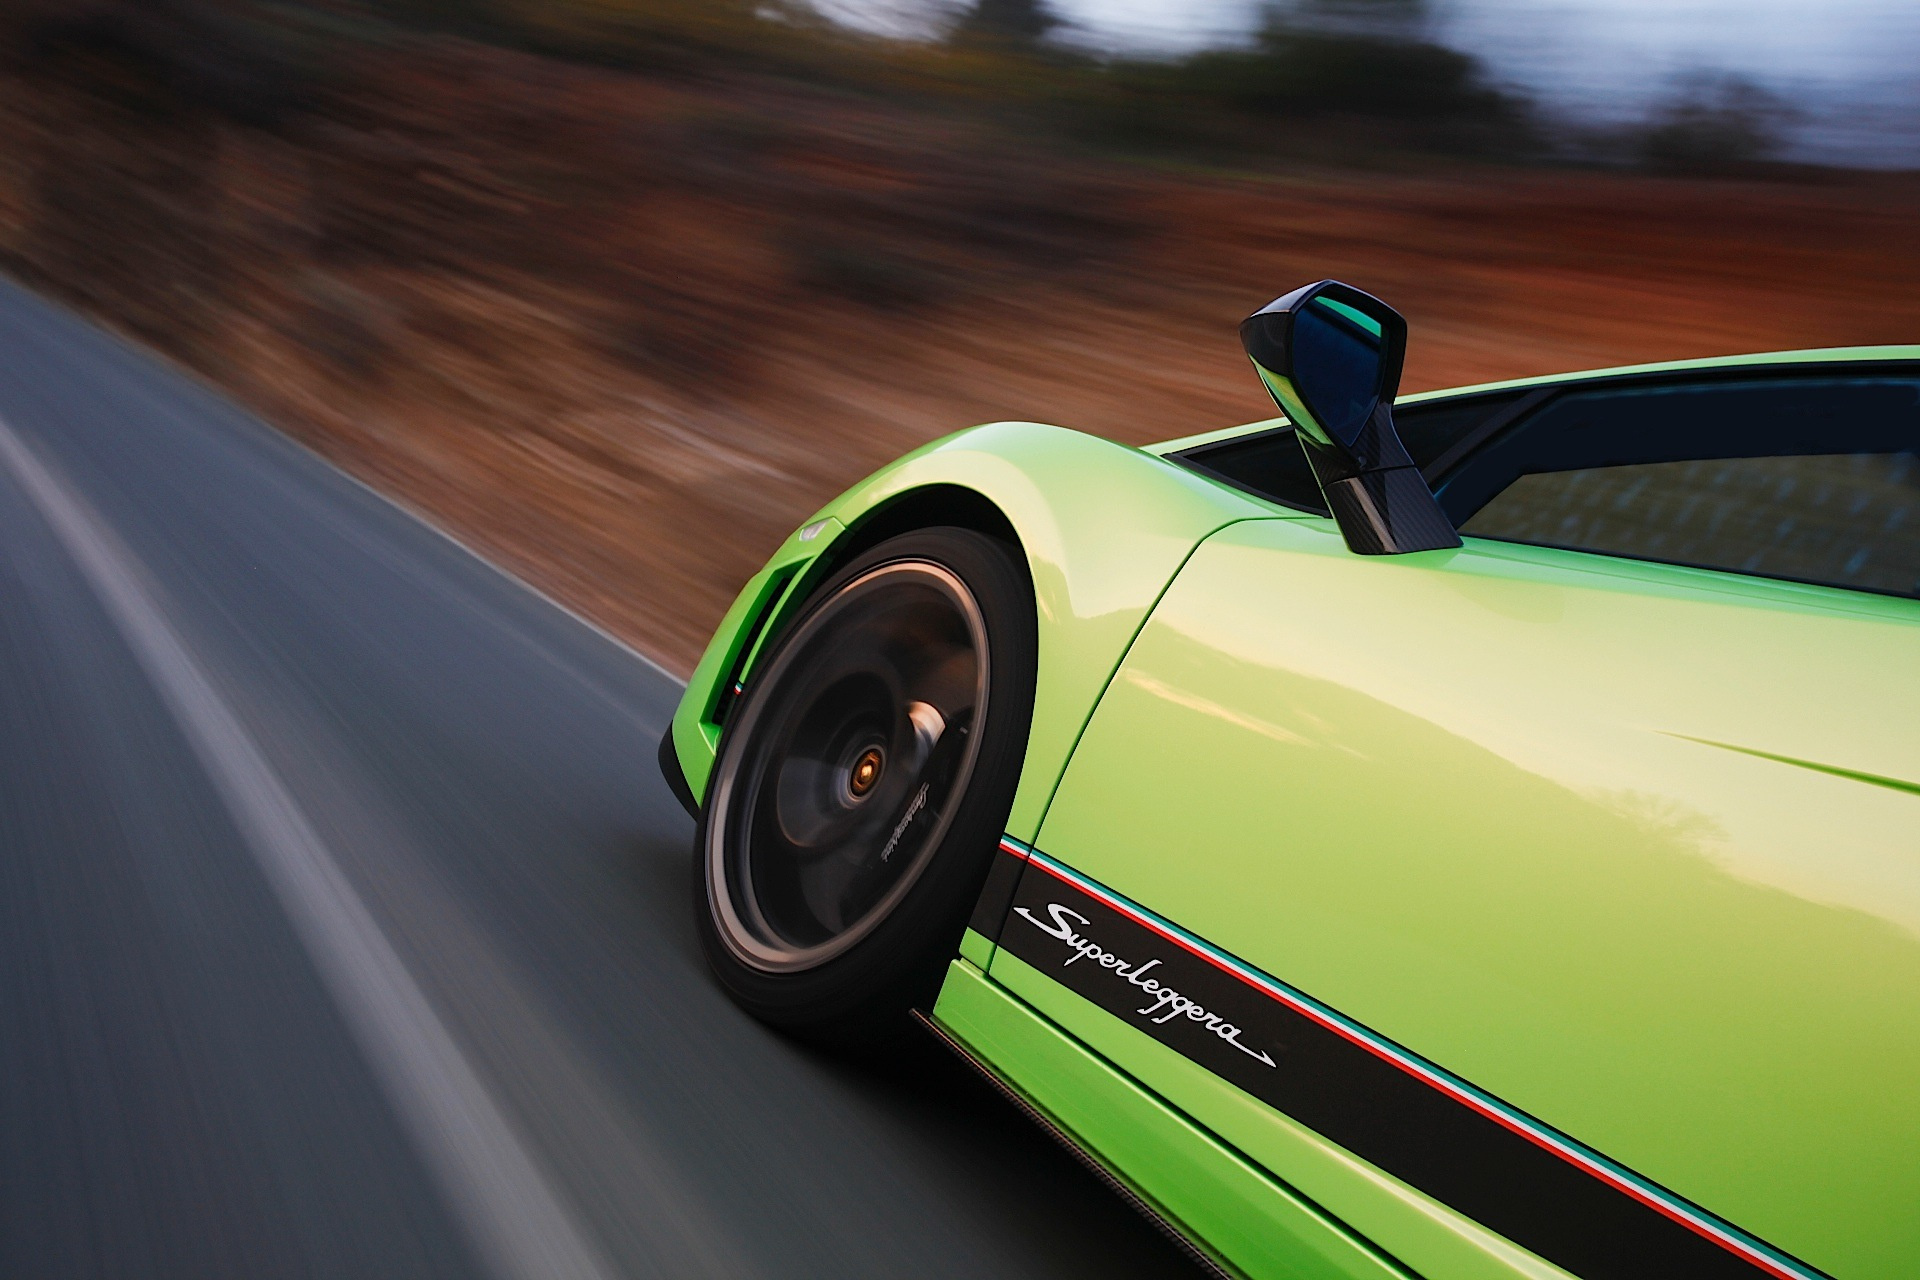 Real Top Speed And Acceleration Mod For Lamborghini Gallardo Lp570 4